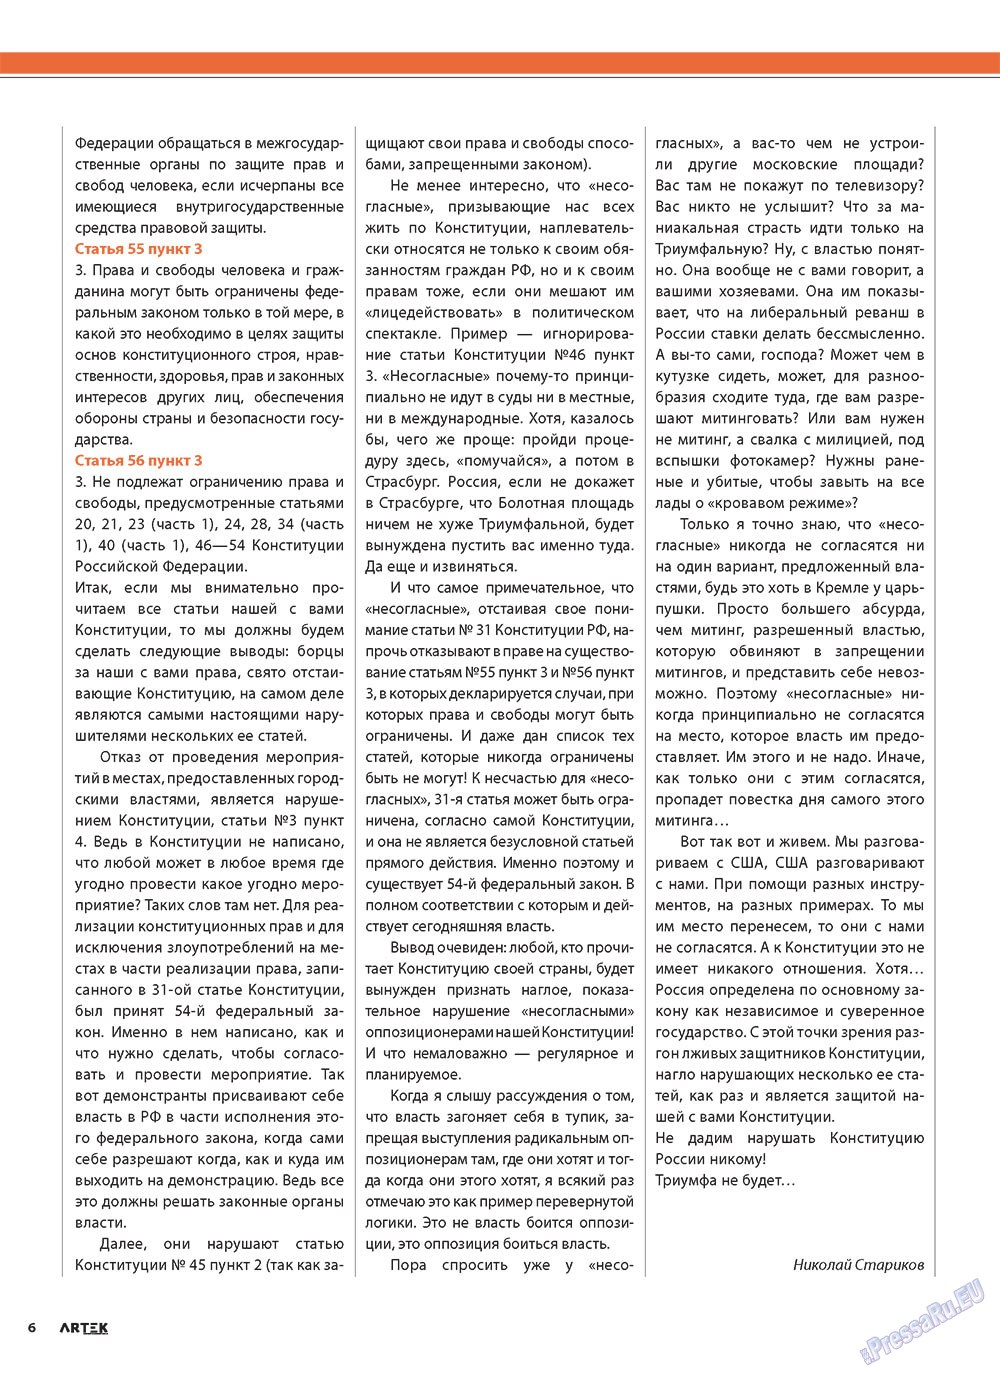 Артек (журнал). 2010 год, номер 6, стр. 8